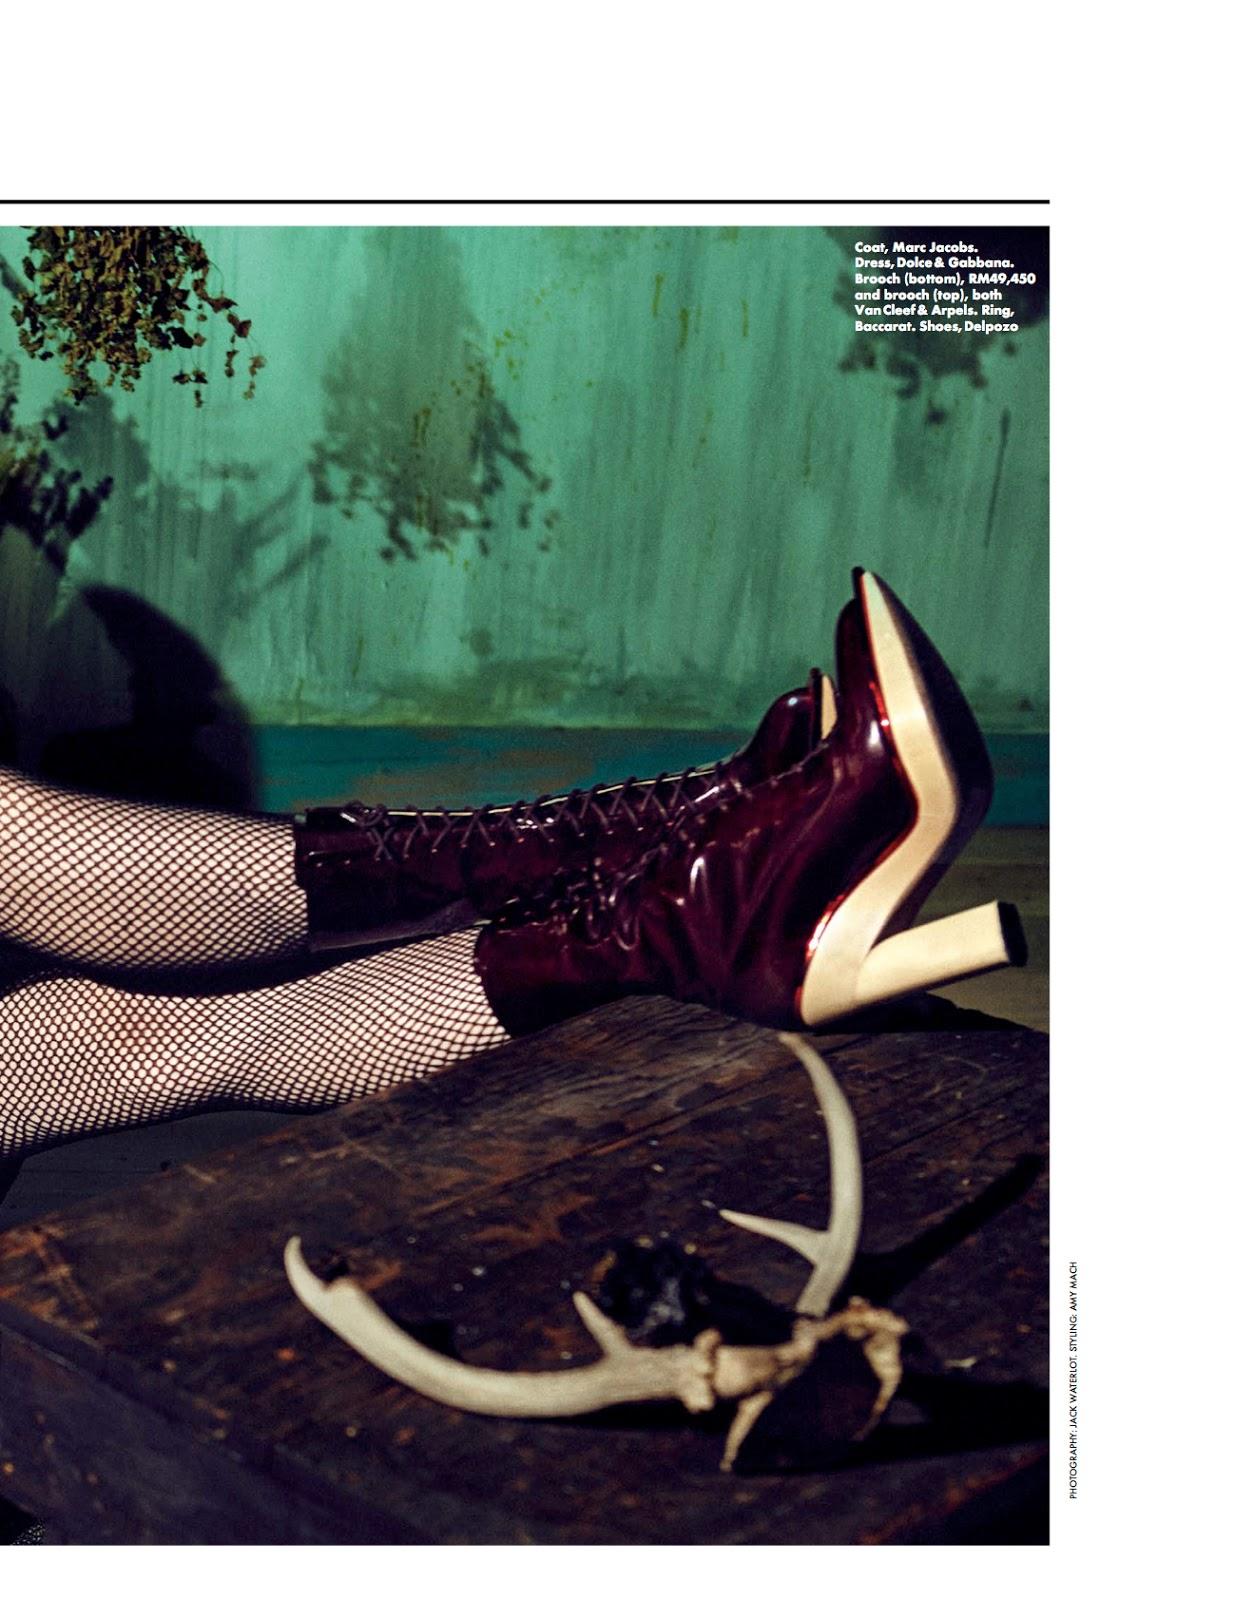 Mood Swing Kelly Mittendorf By Jack Waterlot For Elle